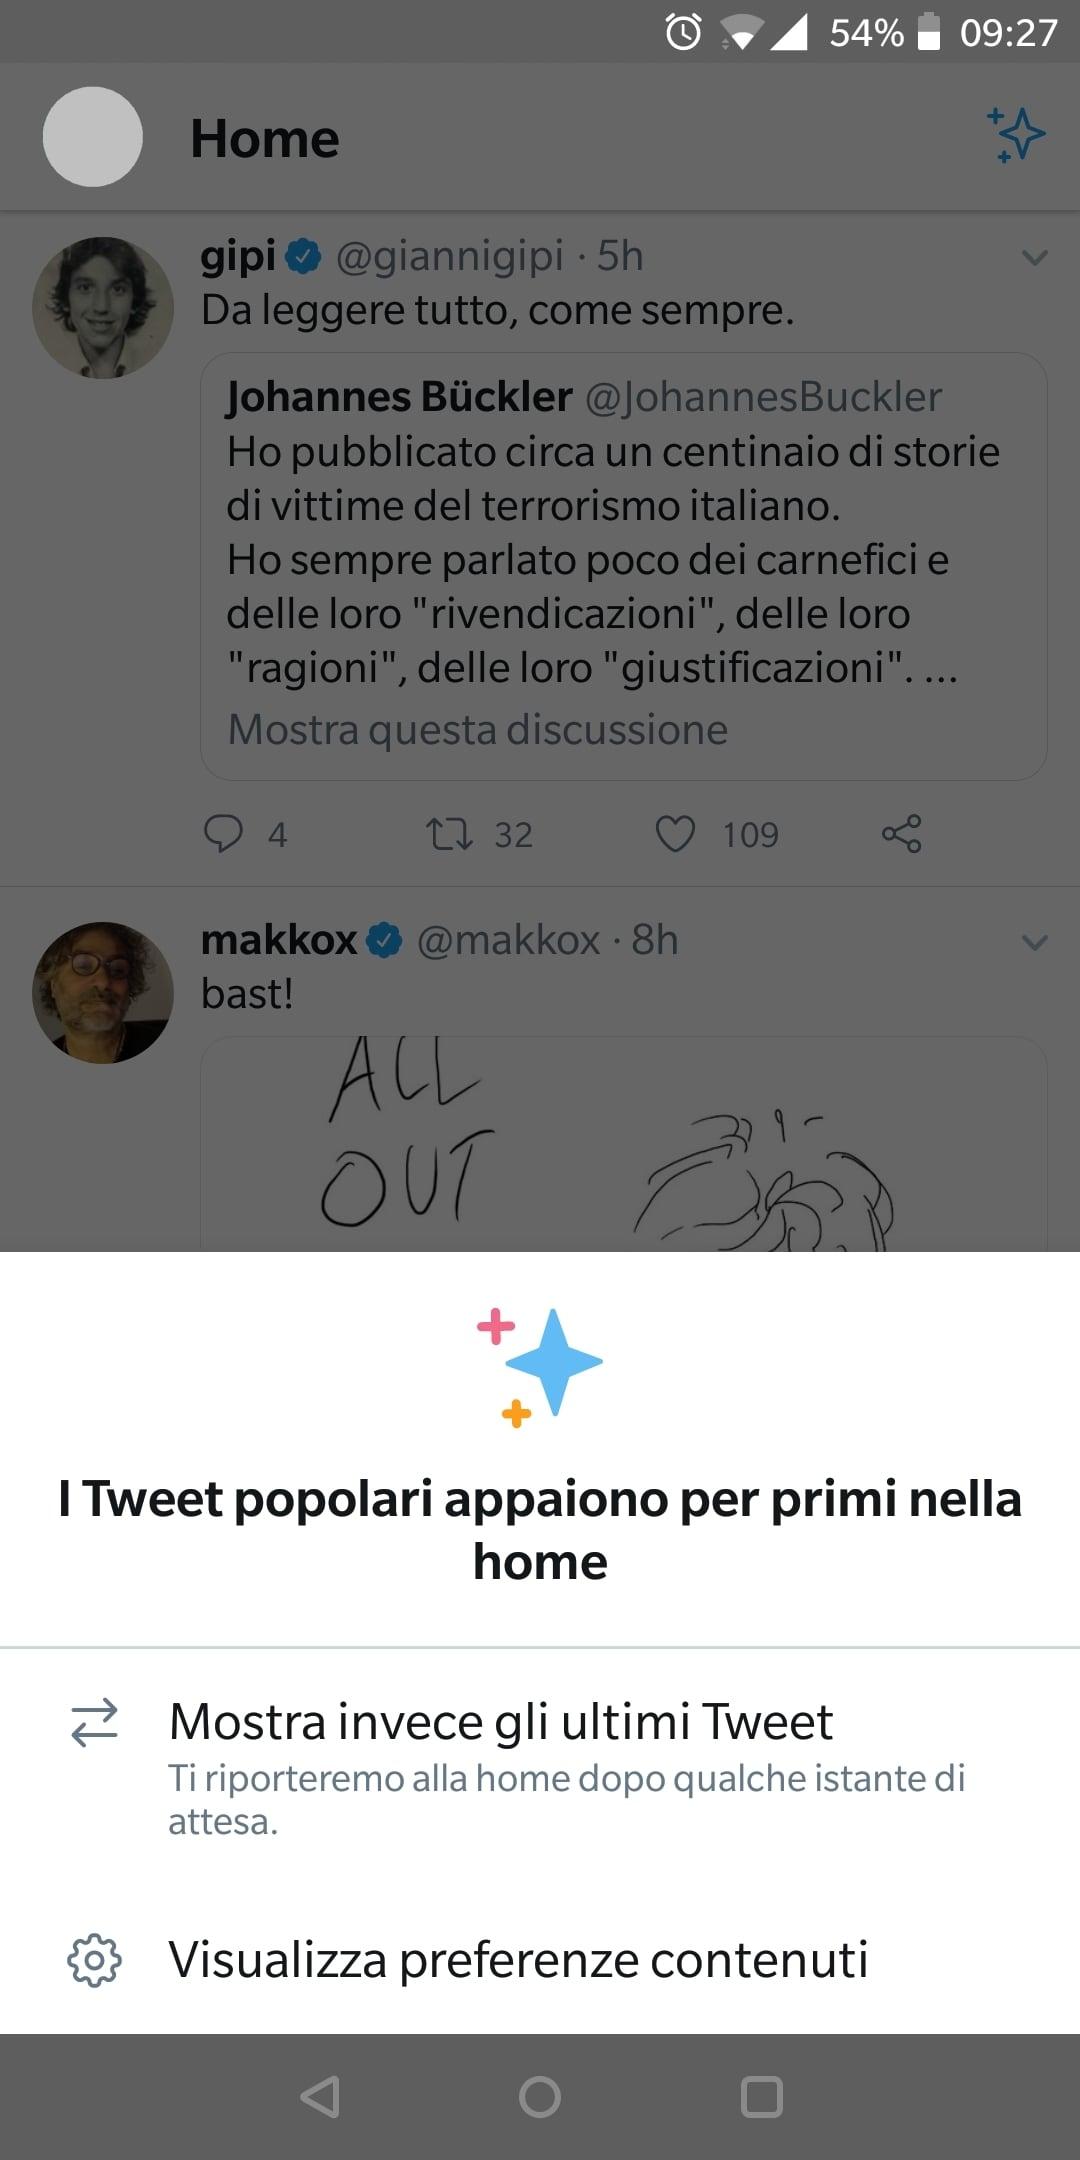 twitter-timeline-1